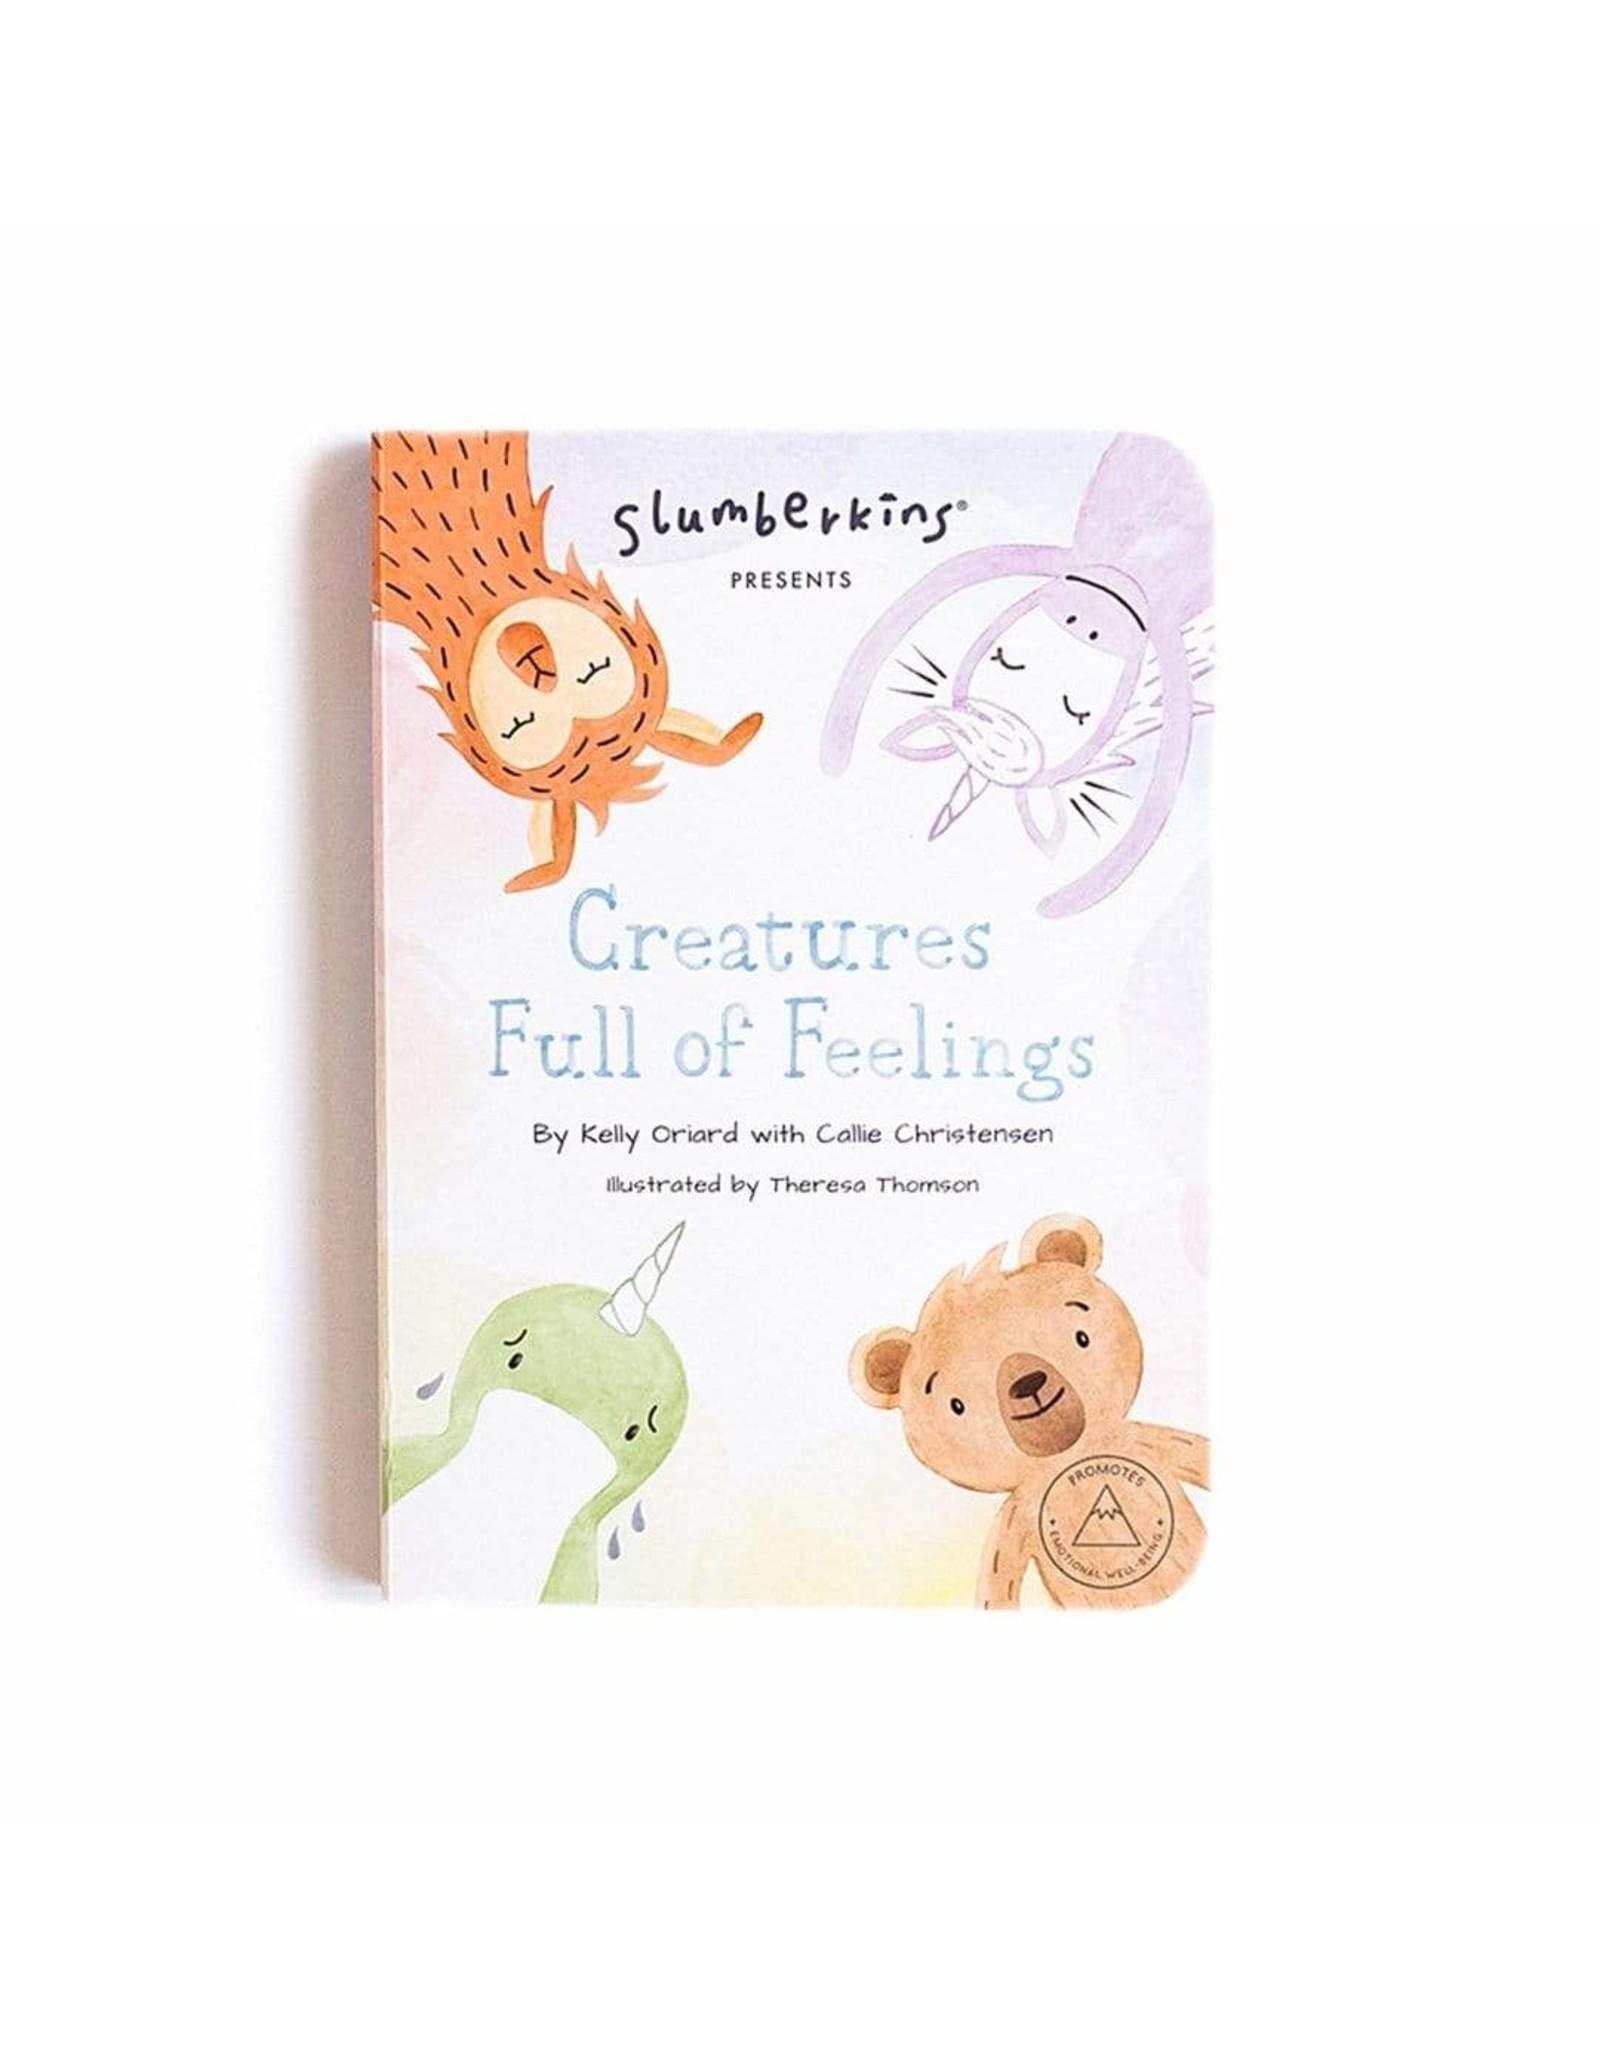 Slumberkins Creatures Full of Feelings Book   Slumberkins